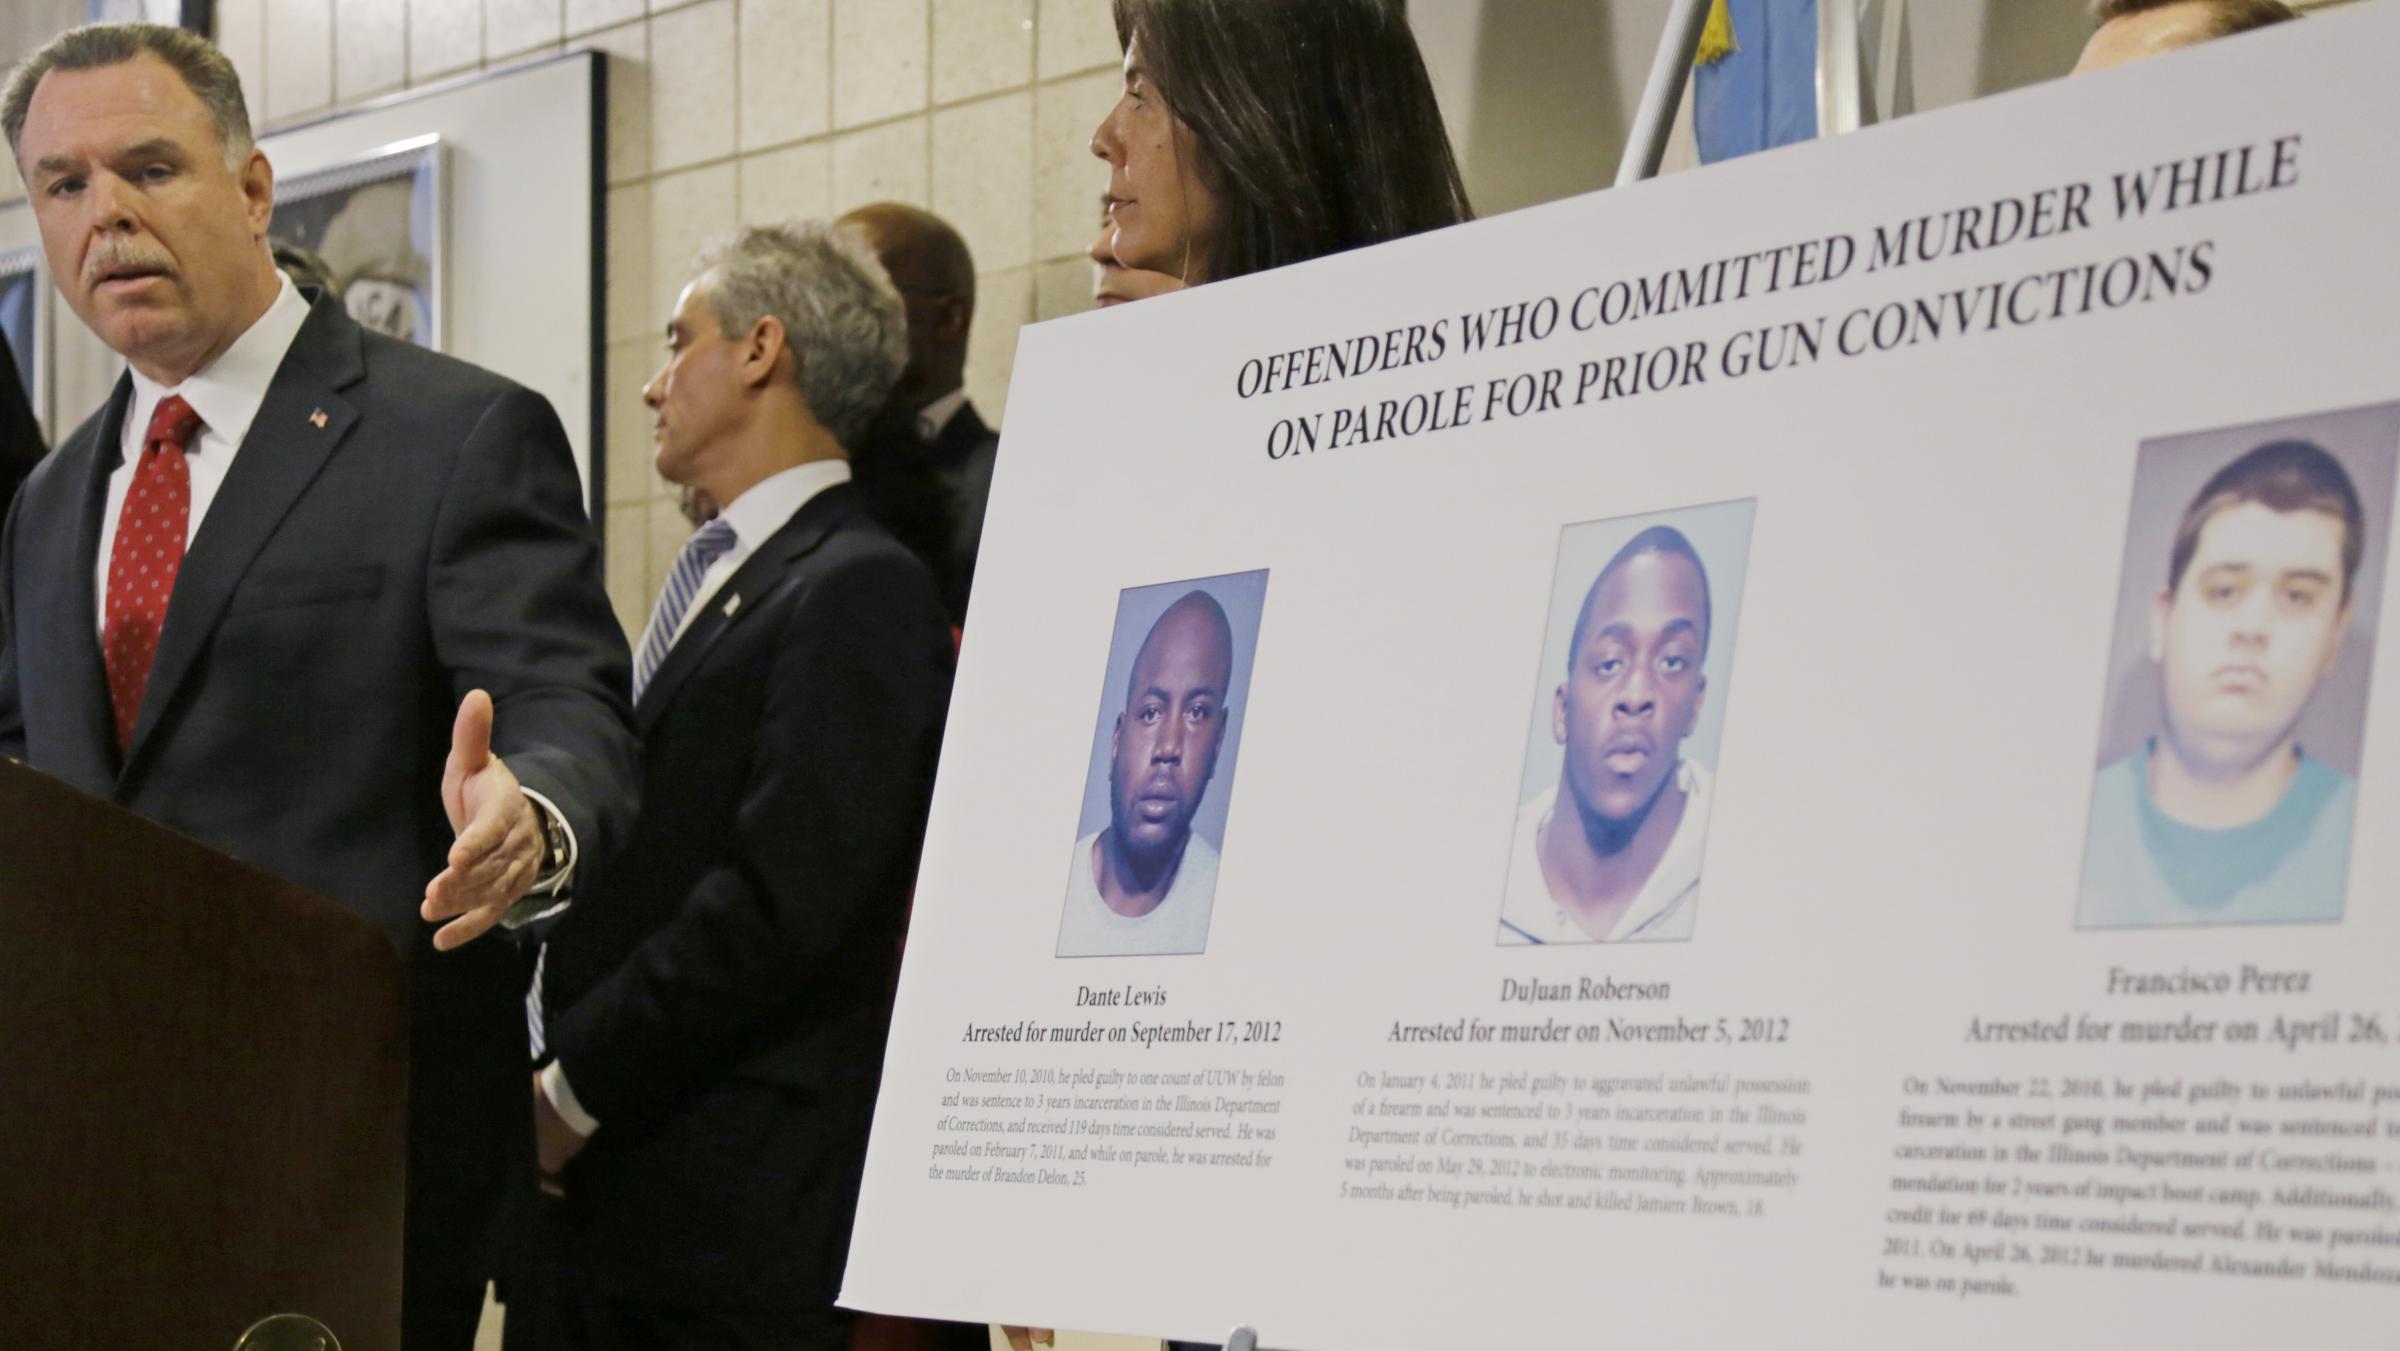 Proposed Minimum Sentencing Law In Illinois Faces Scrutiny